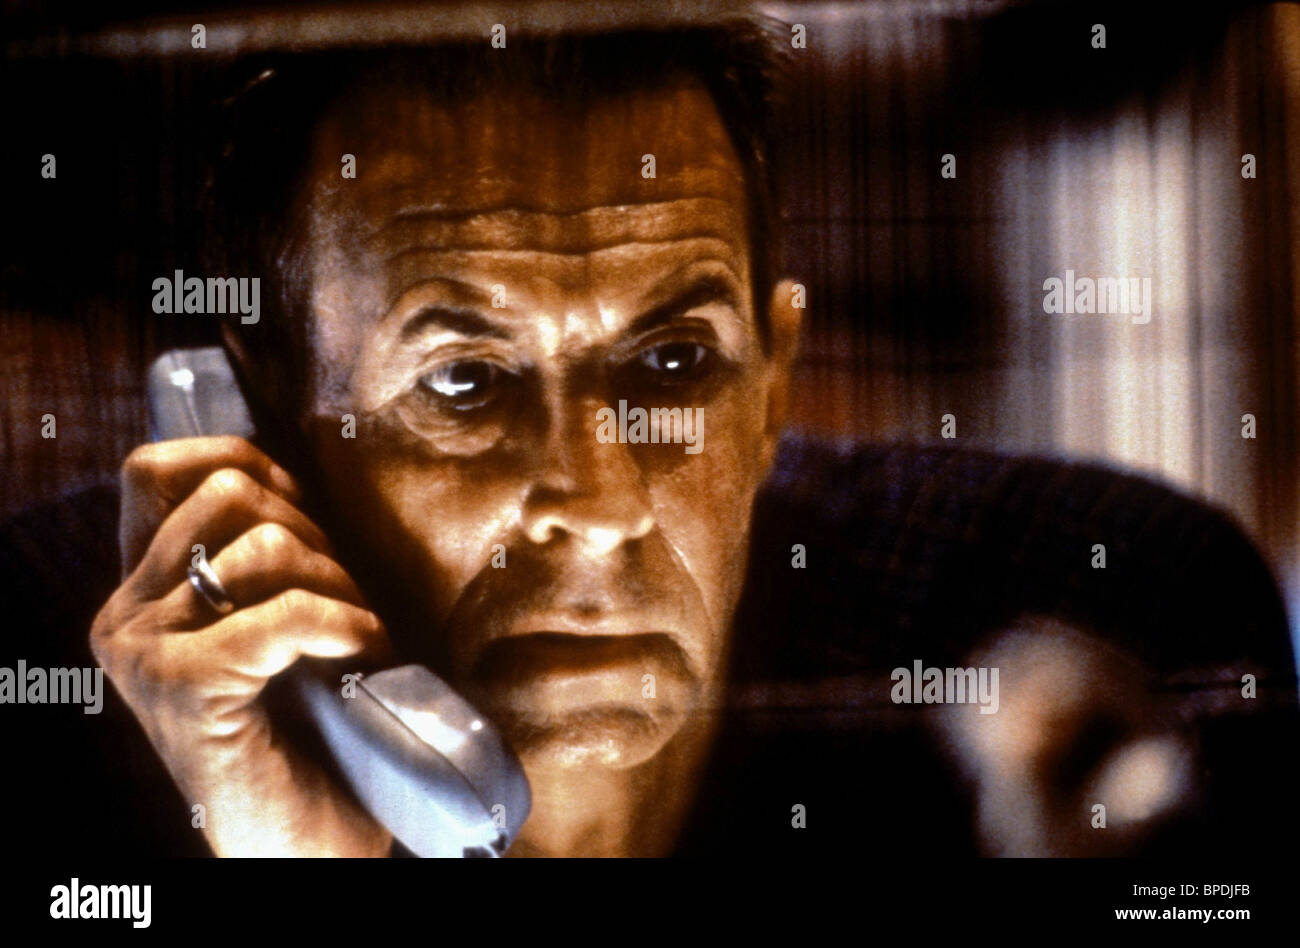 ANTHONY PERKINS PSYCHO IV: THE BEGINNING (1990) - Stock Image